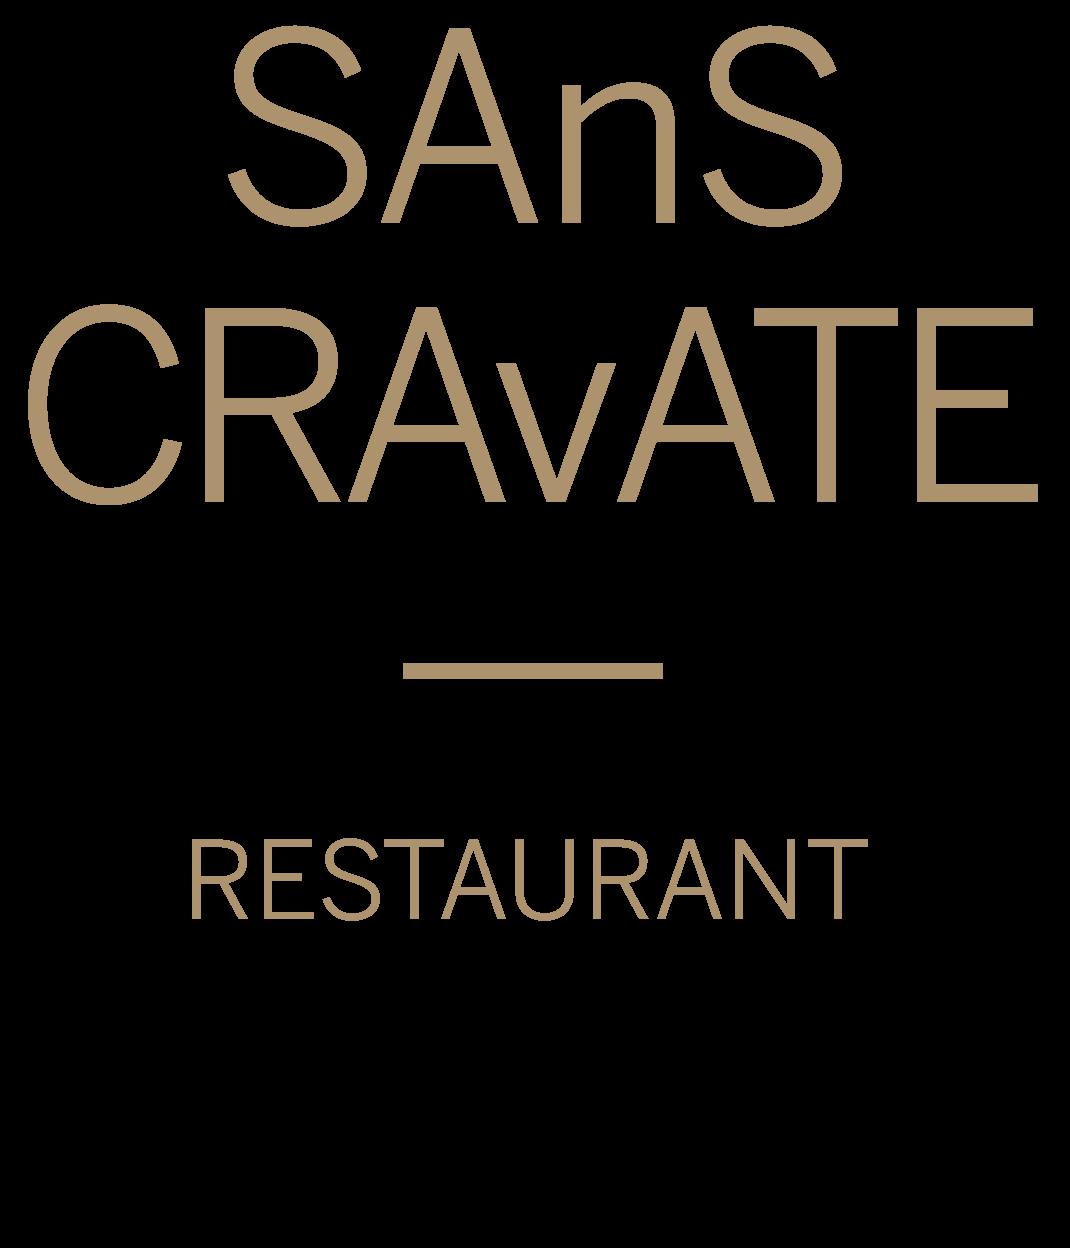 Sans Cravate Restaurant